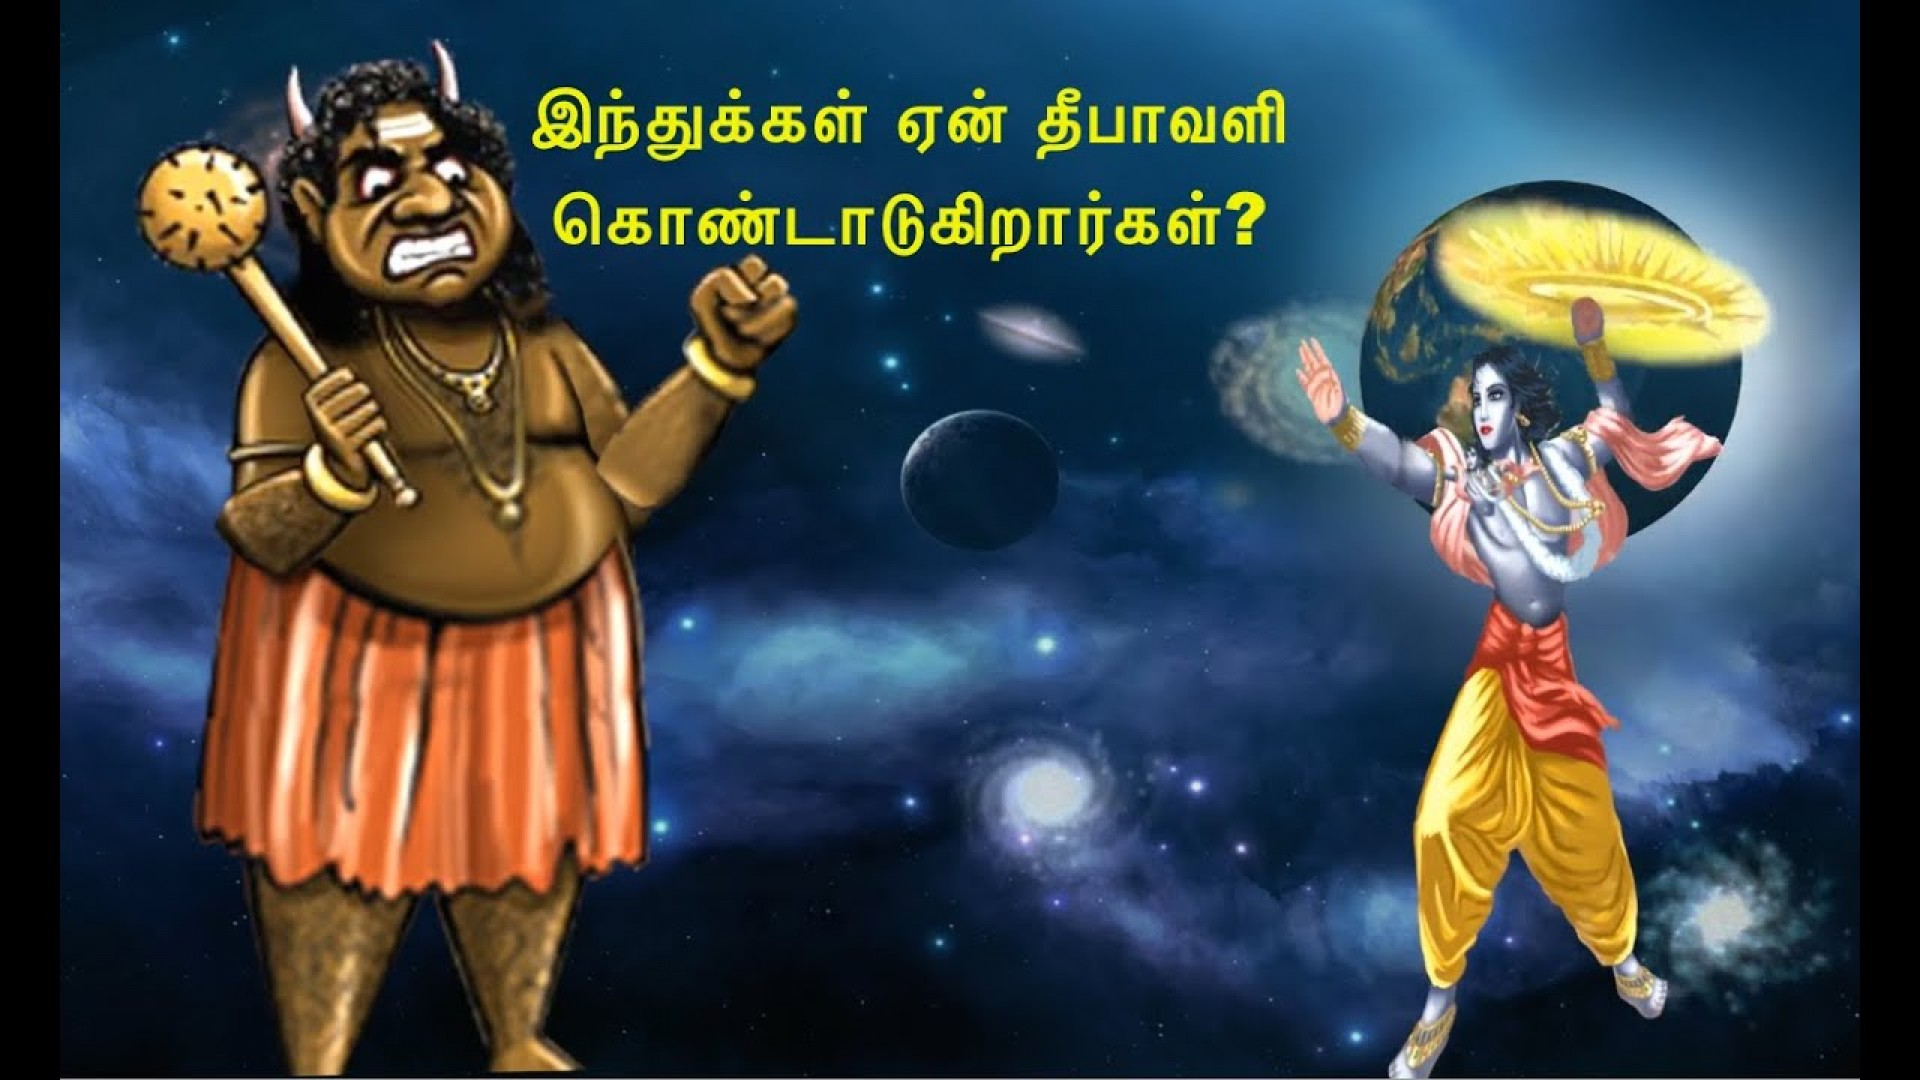 008 Deepavali Festival Essay In Tamil Maxresdefault Unbelievable Christmas Language Diwali 1920